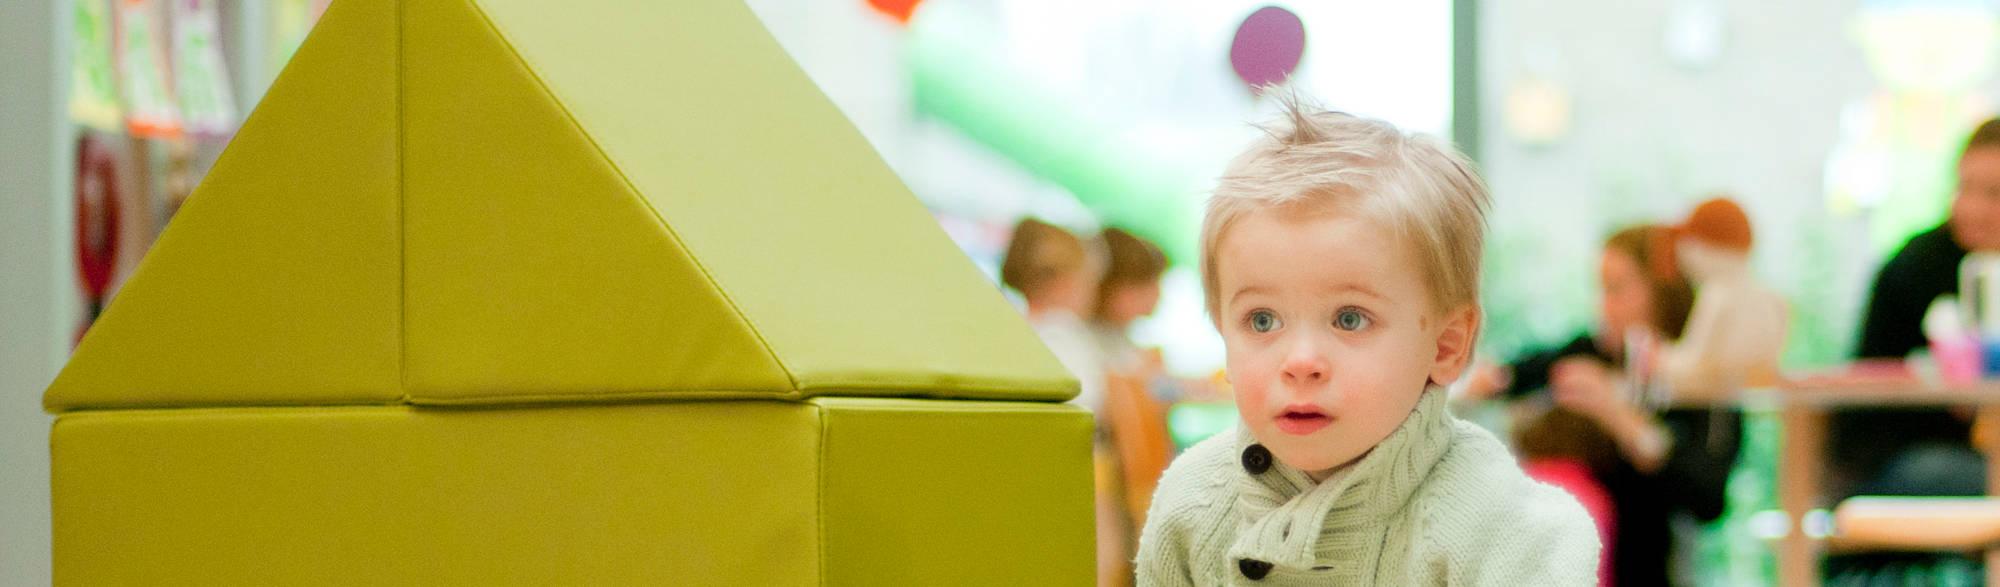 Stoerrr – Kids Concepts